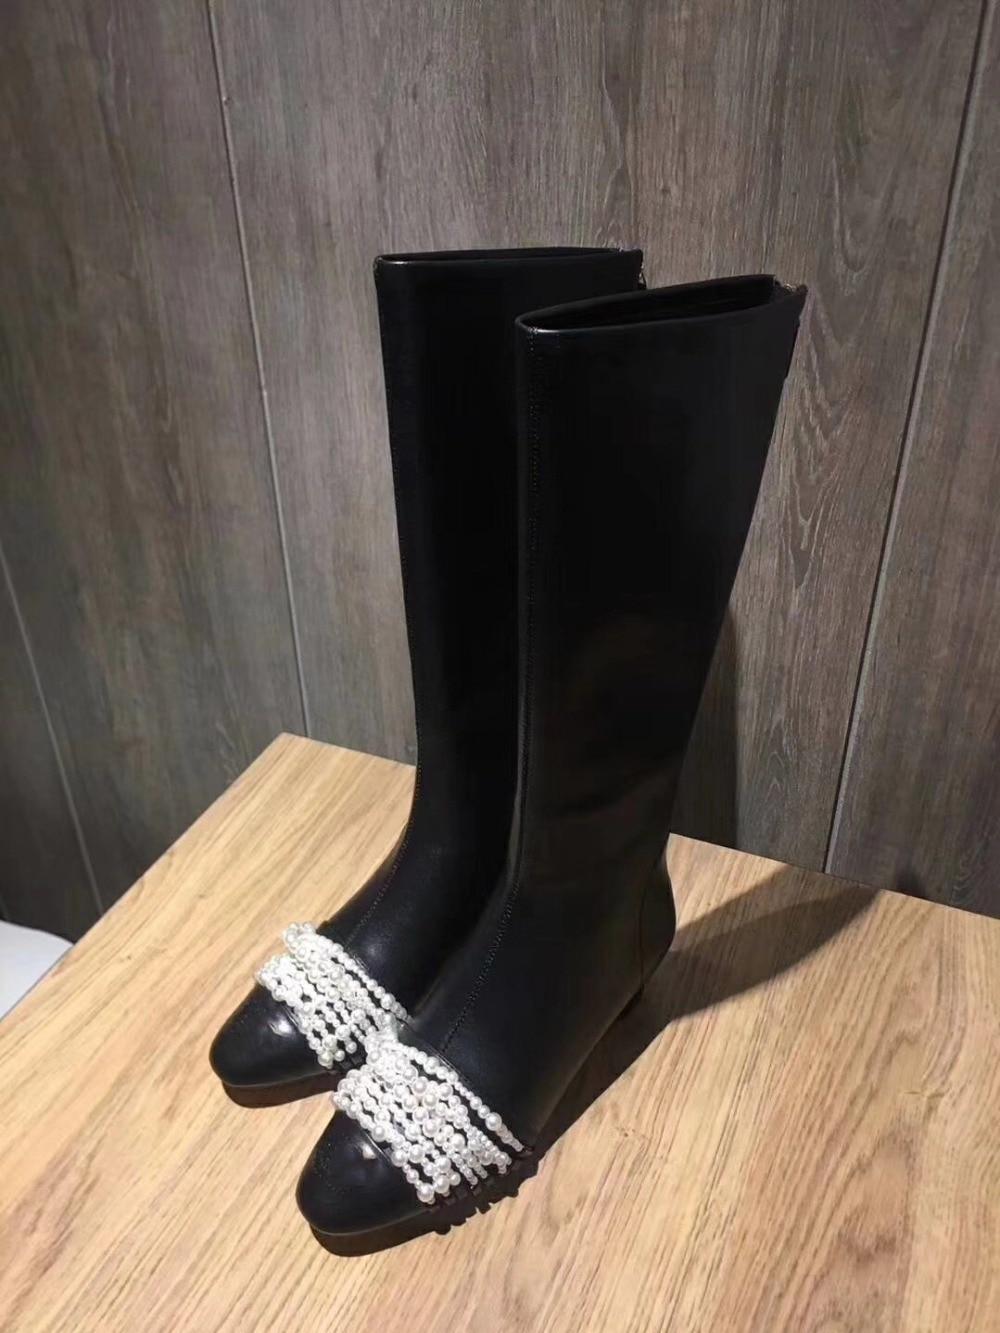 Piste Chevalier Nouvelle Sapato Cuir Longue Chaussons Chaussures As Femmes Pic Chic 2019 Feminino Perle Talons Bottes Décor Marque Funky Étoiles qEd0wZcS